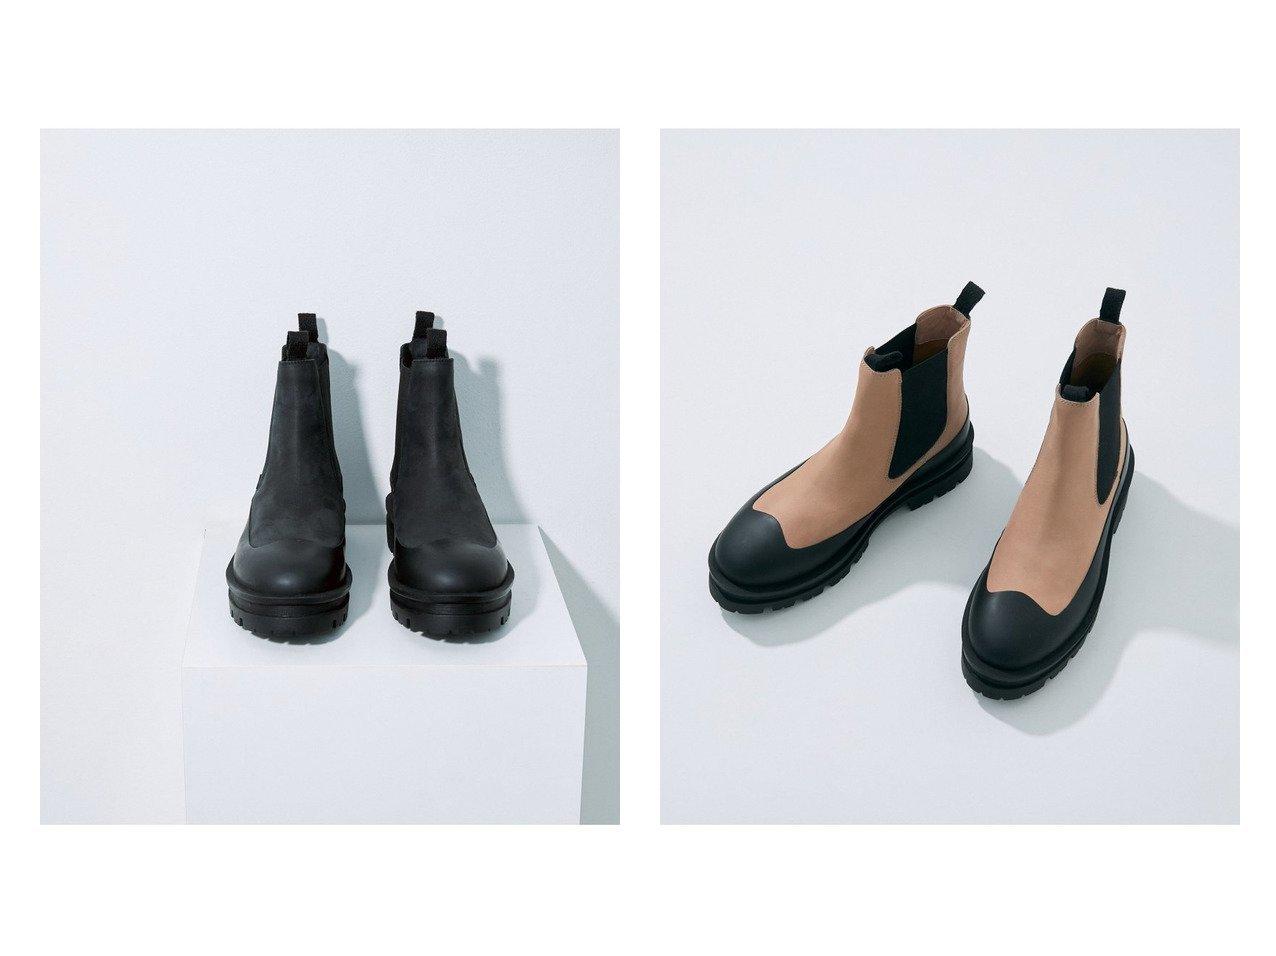 【ADAM ET ROPE'/アダム エ ロペ】の【JVAM for ADAM ET ROPE 】CHUNKY CHELSEA BOOT NUBUK 別注・限定・コラボなど、おすすめ!人気、トレンド・レディースファッションの通販 おすすめで人気の流行・トレンド、ファッションの通販商品 インテリア・家具・メンズファッション・キッズファッション・レディースファッション・服の通販 founy(ファニー) https://founy.com/ ファッション Fashion レディースファッション WOMEN インソール インド コレクション シューズ ショート トレンド ベーシック 別注 メンズ NEW・新作・新着・新入荷 New Arrivals  ID:crp329100000057265